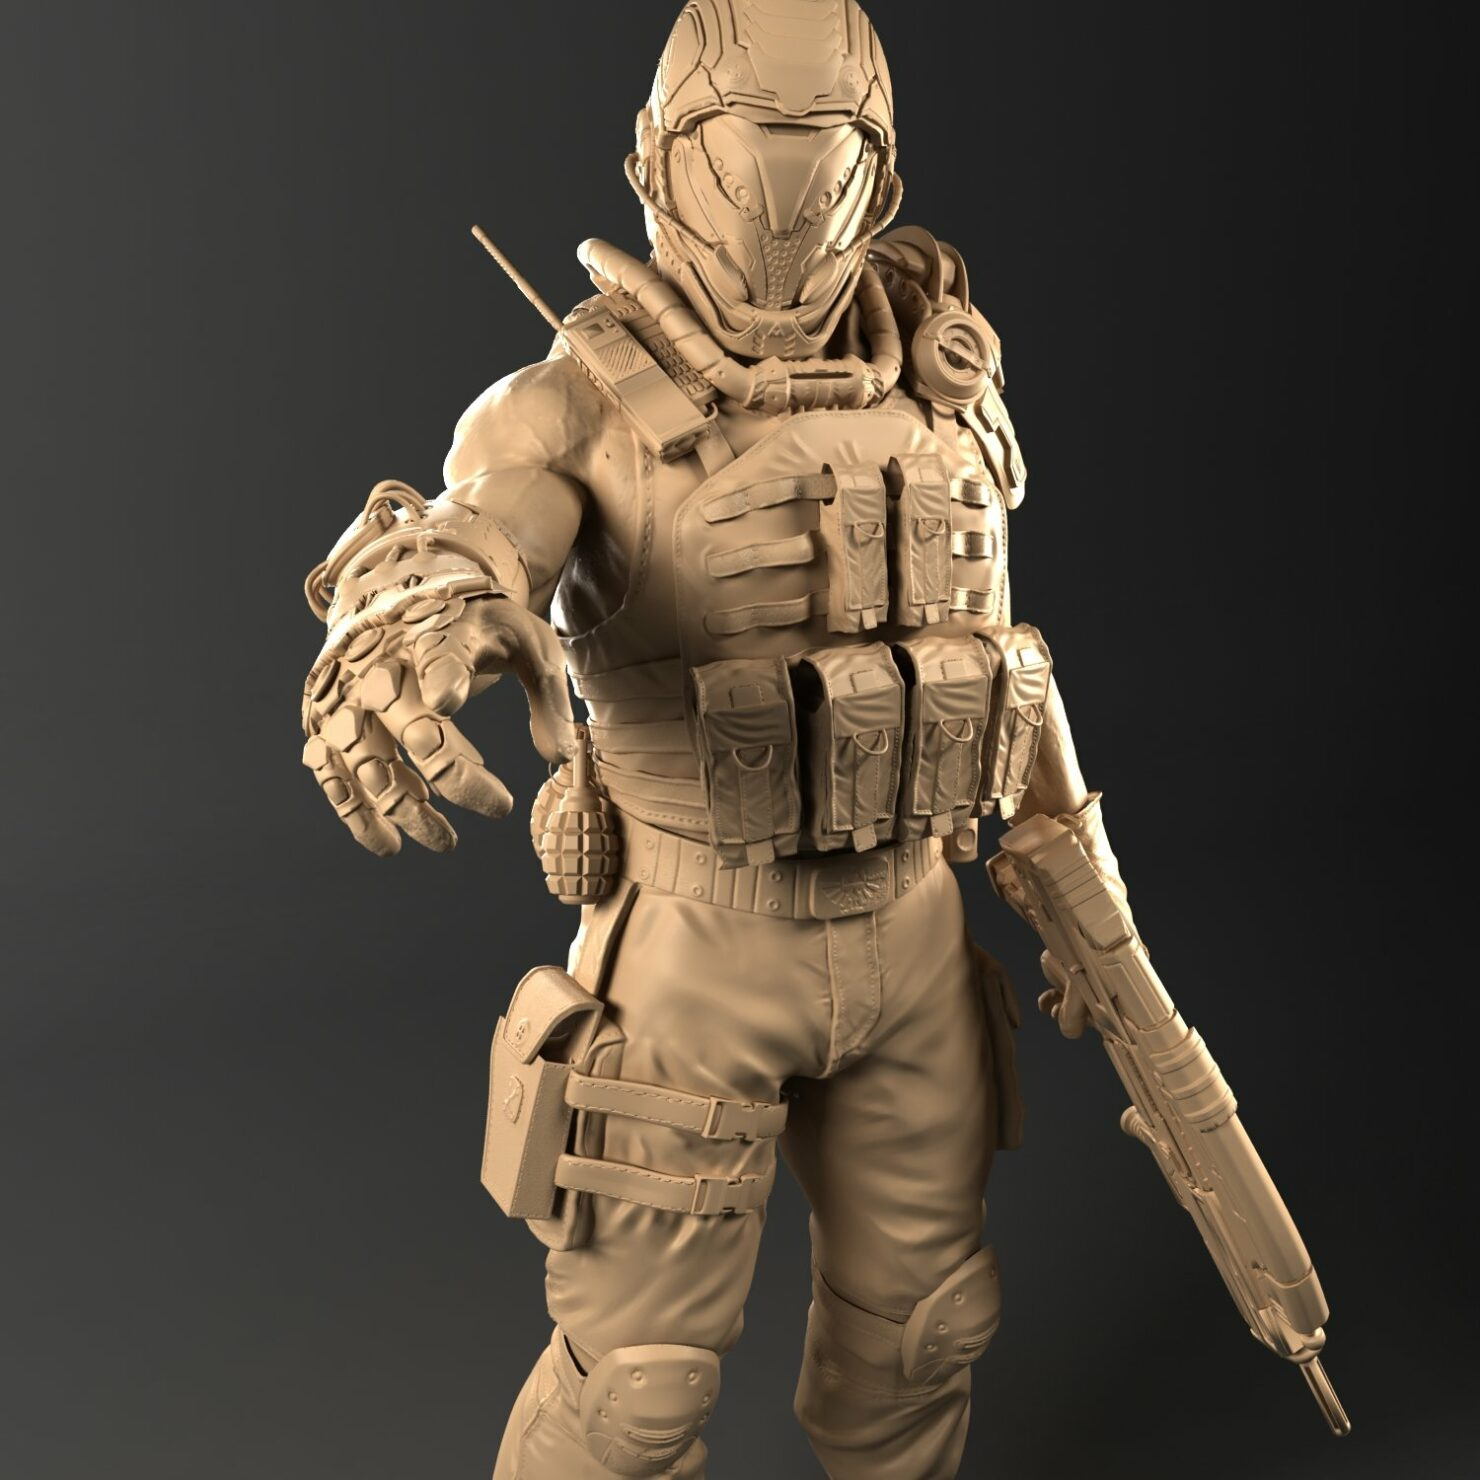 new_sci-fi_soldier_with_gun_dgwerrggwr